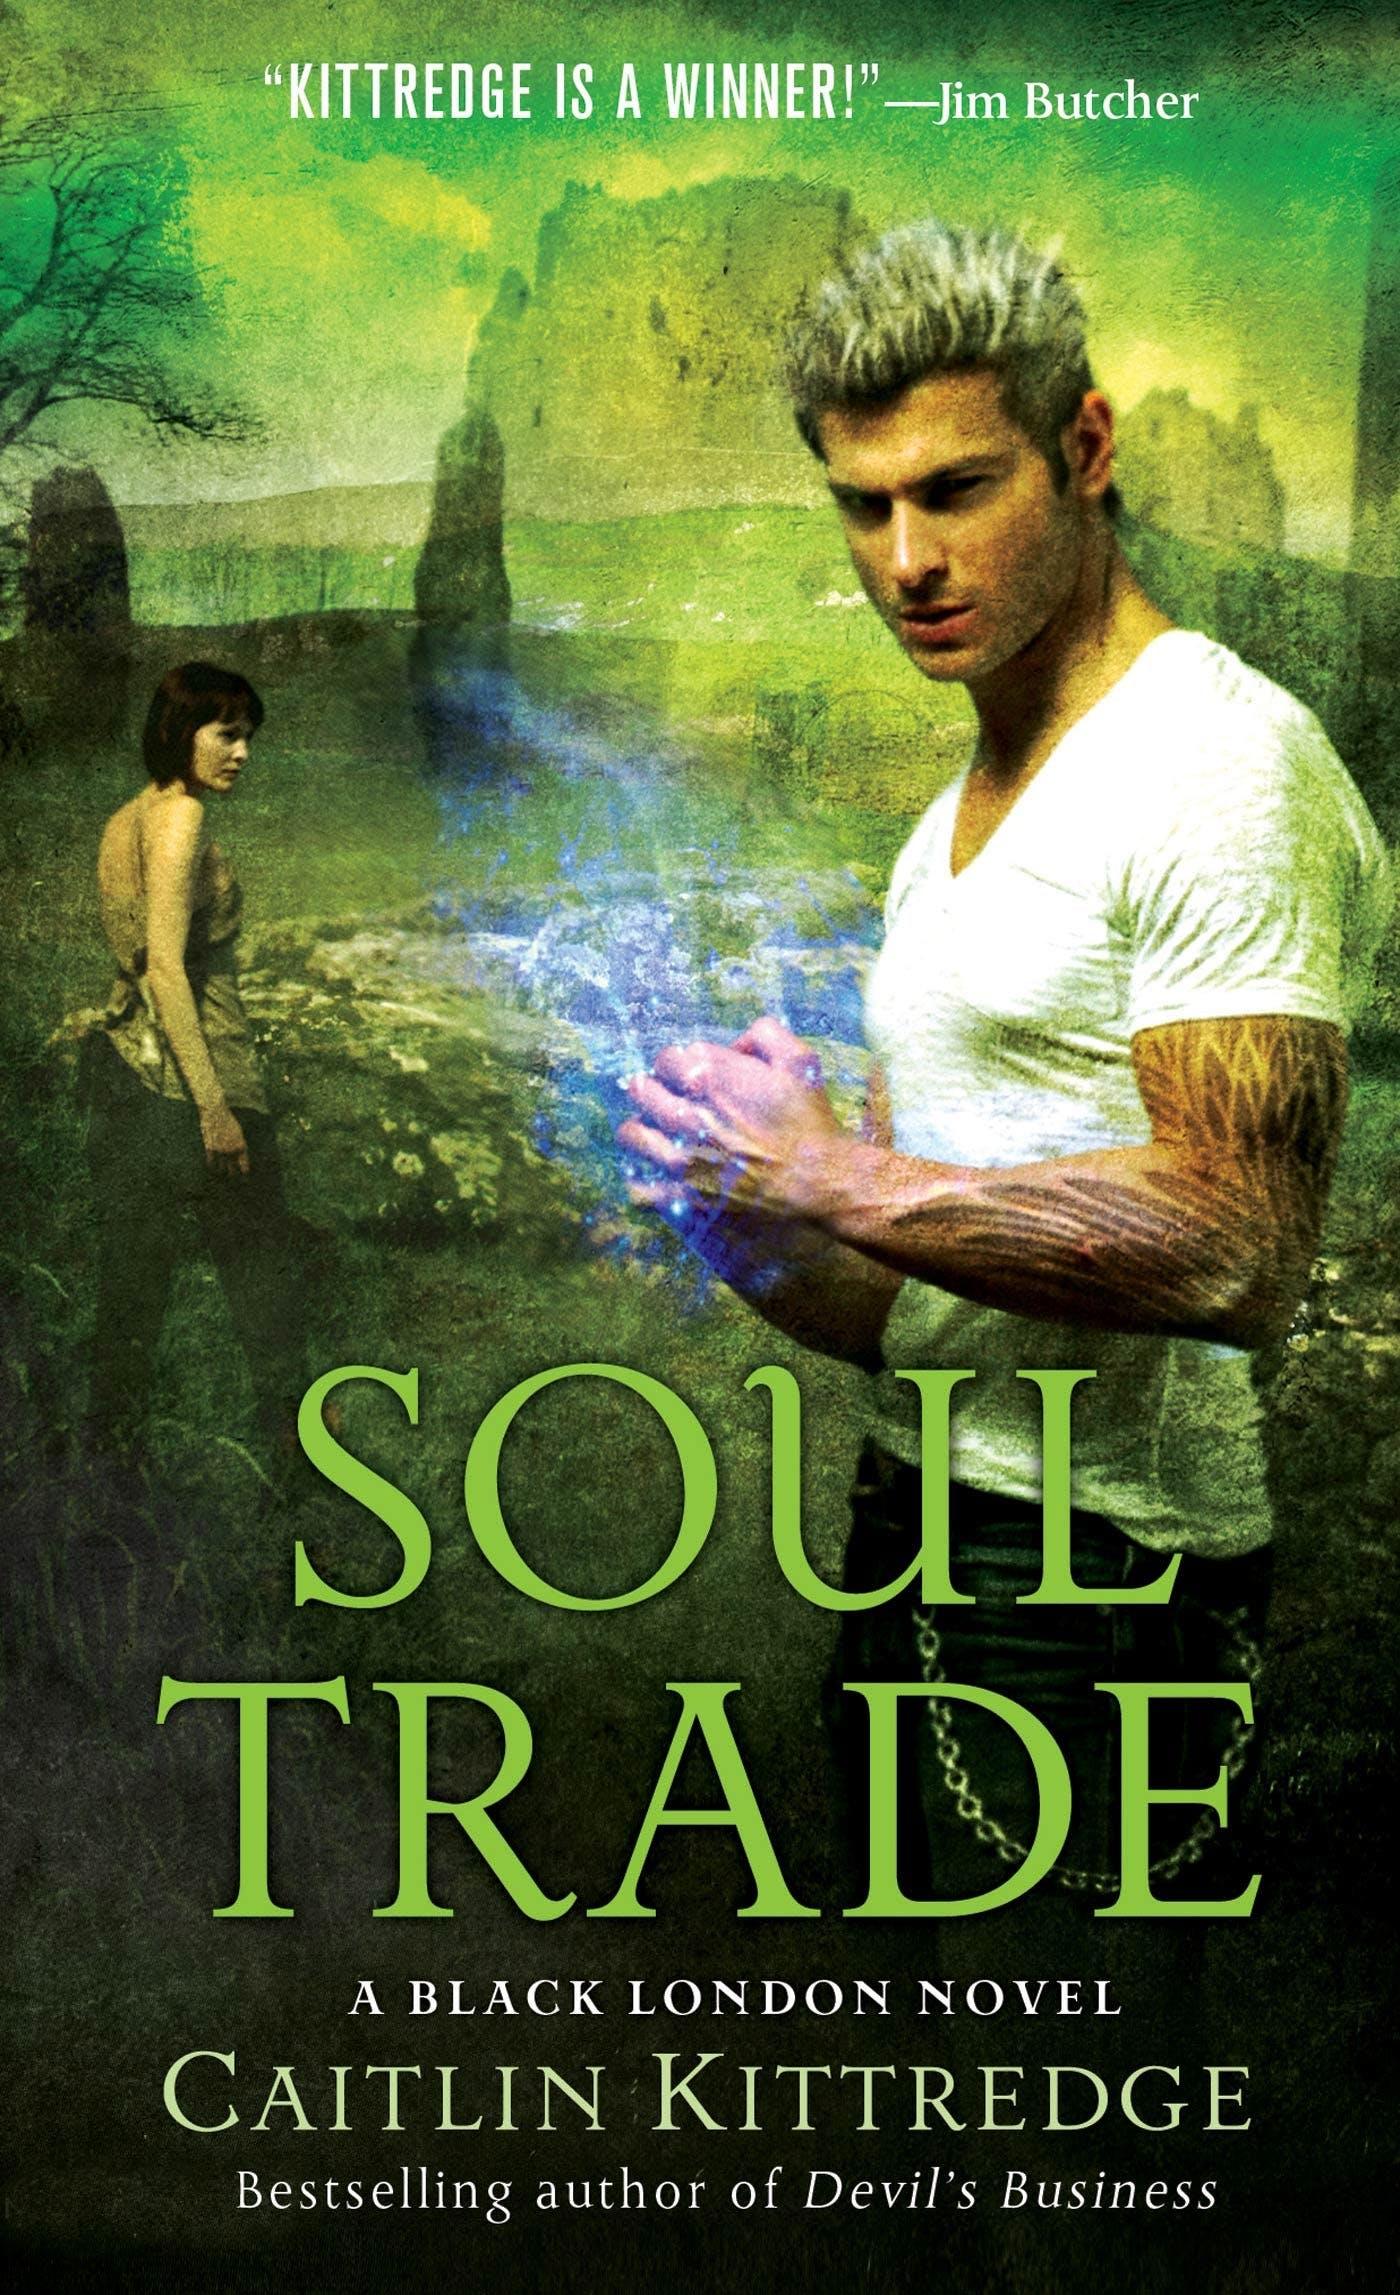 Image of Soul Trade